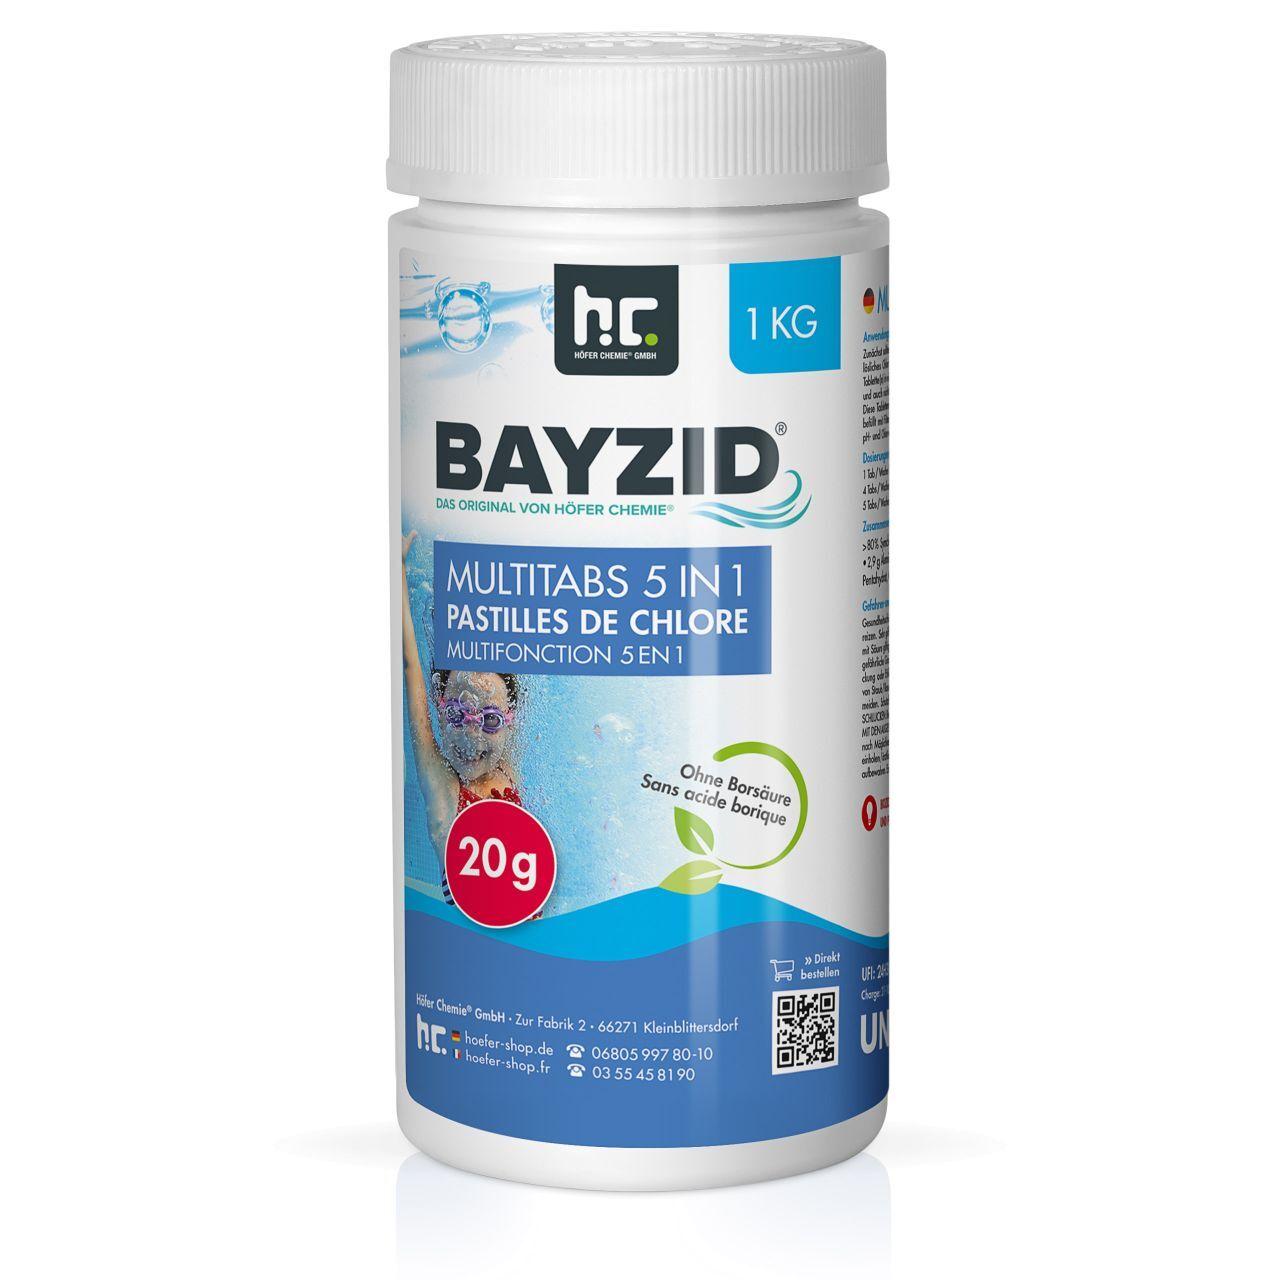 BAYZID 1 kg Bayzid® pastilles de chlore multifonction 20g 5 en 1 (1 x 1 kg)